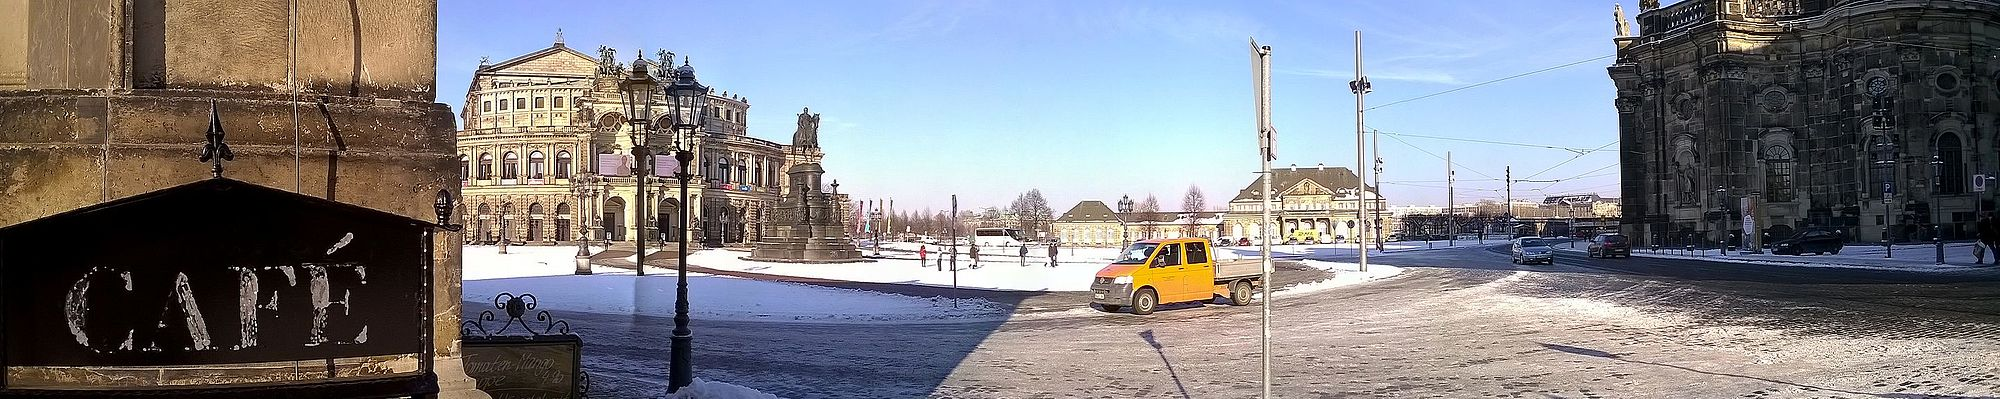 Die Semperoper in Dresden Winter Panorama Image 0001 Lupus in Saxonia